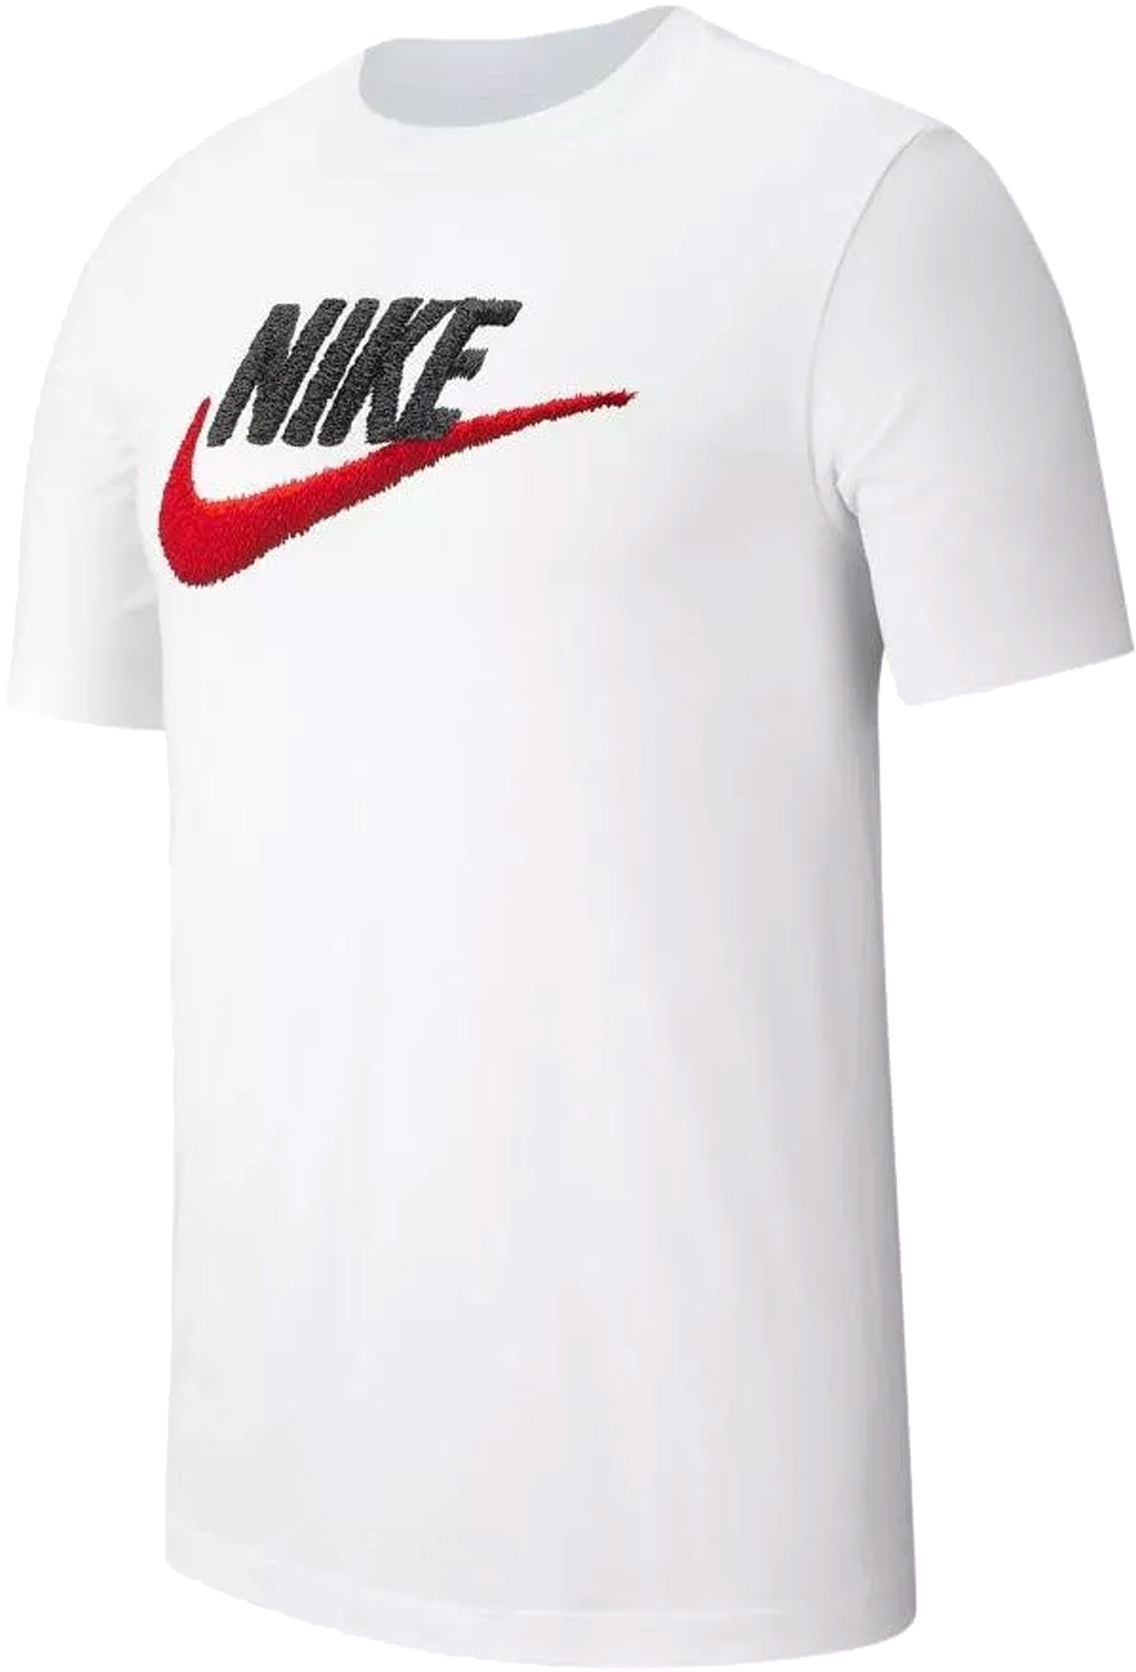 Nike KOSZULKA M NSW TEE BRAND MARK AR4993-100